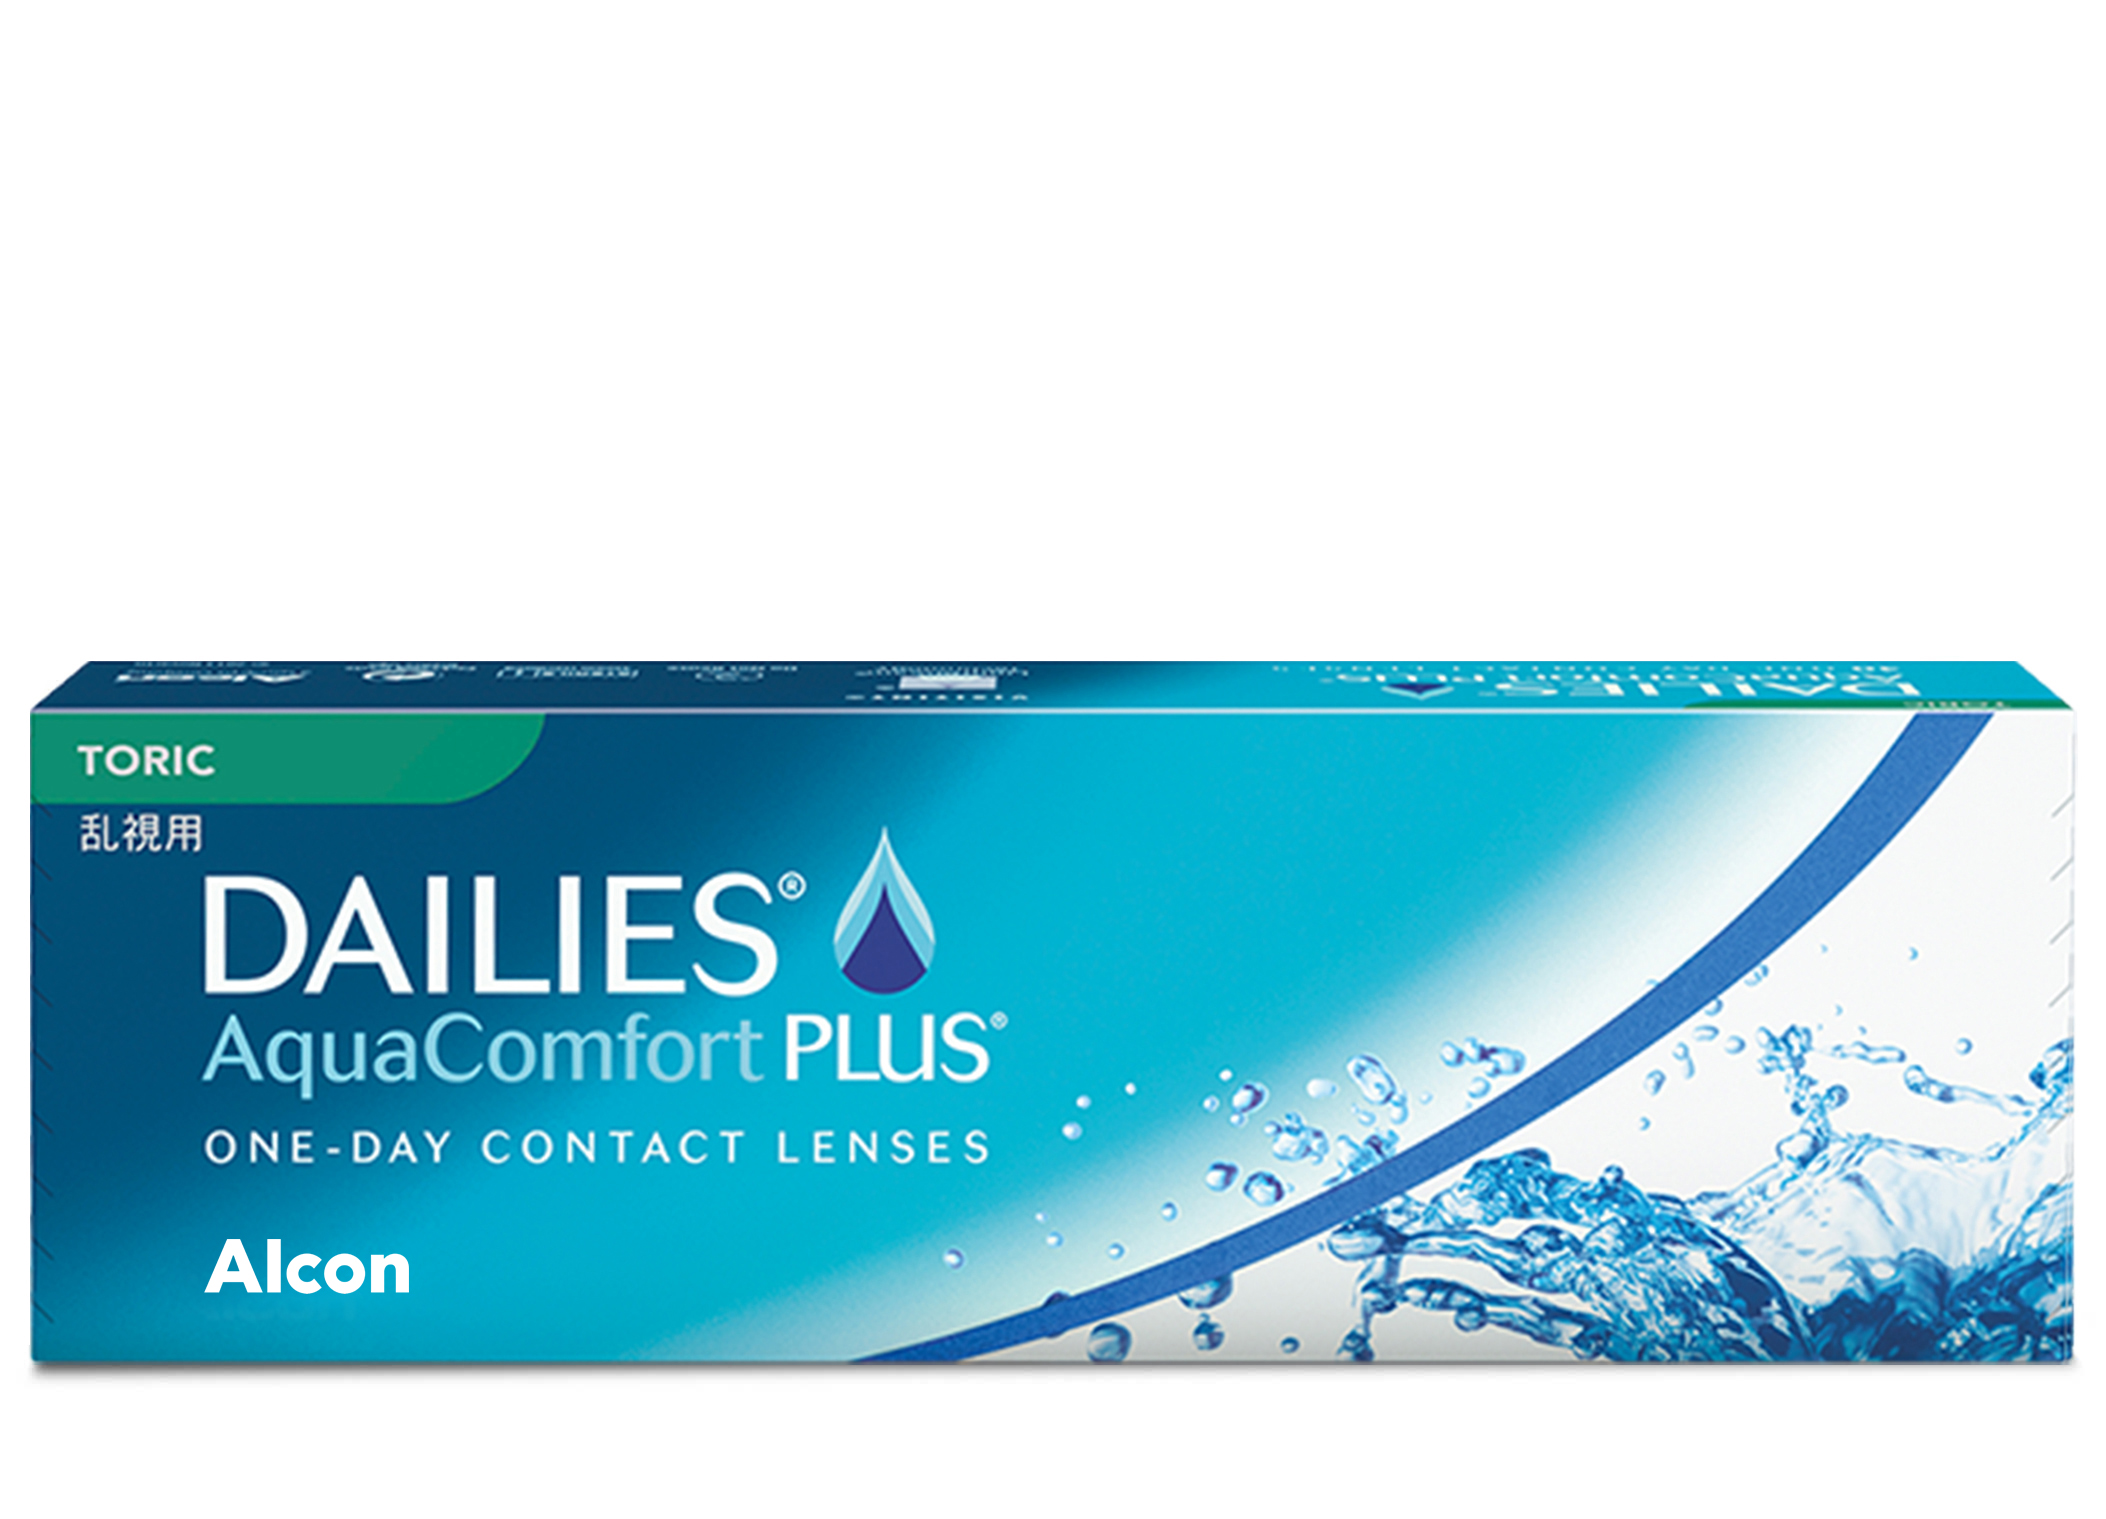 ch multifocale aquacomfort comforter parfum kontaktlinsen aqua new plus lensix kontaktlinse multifocal pflegemittel tageslinsen sonnenbrillen dailies comfort